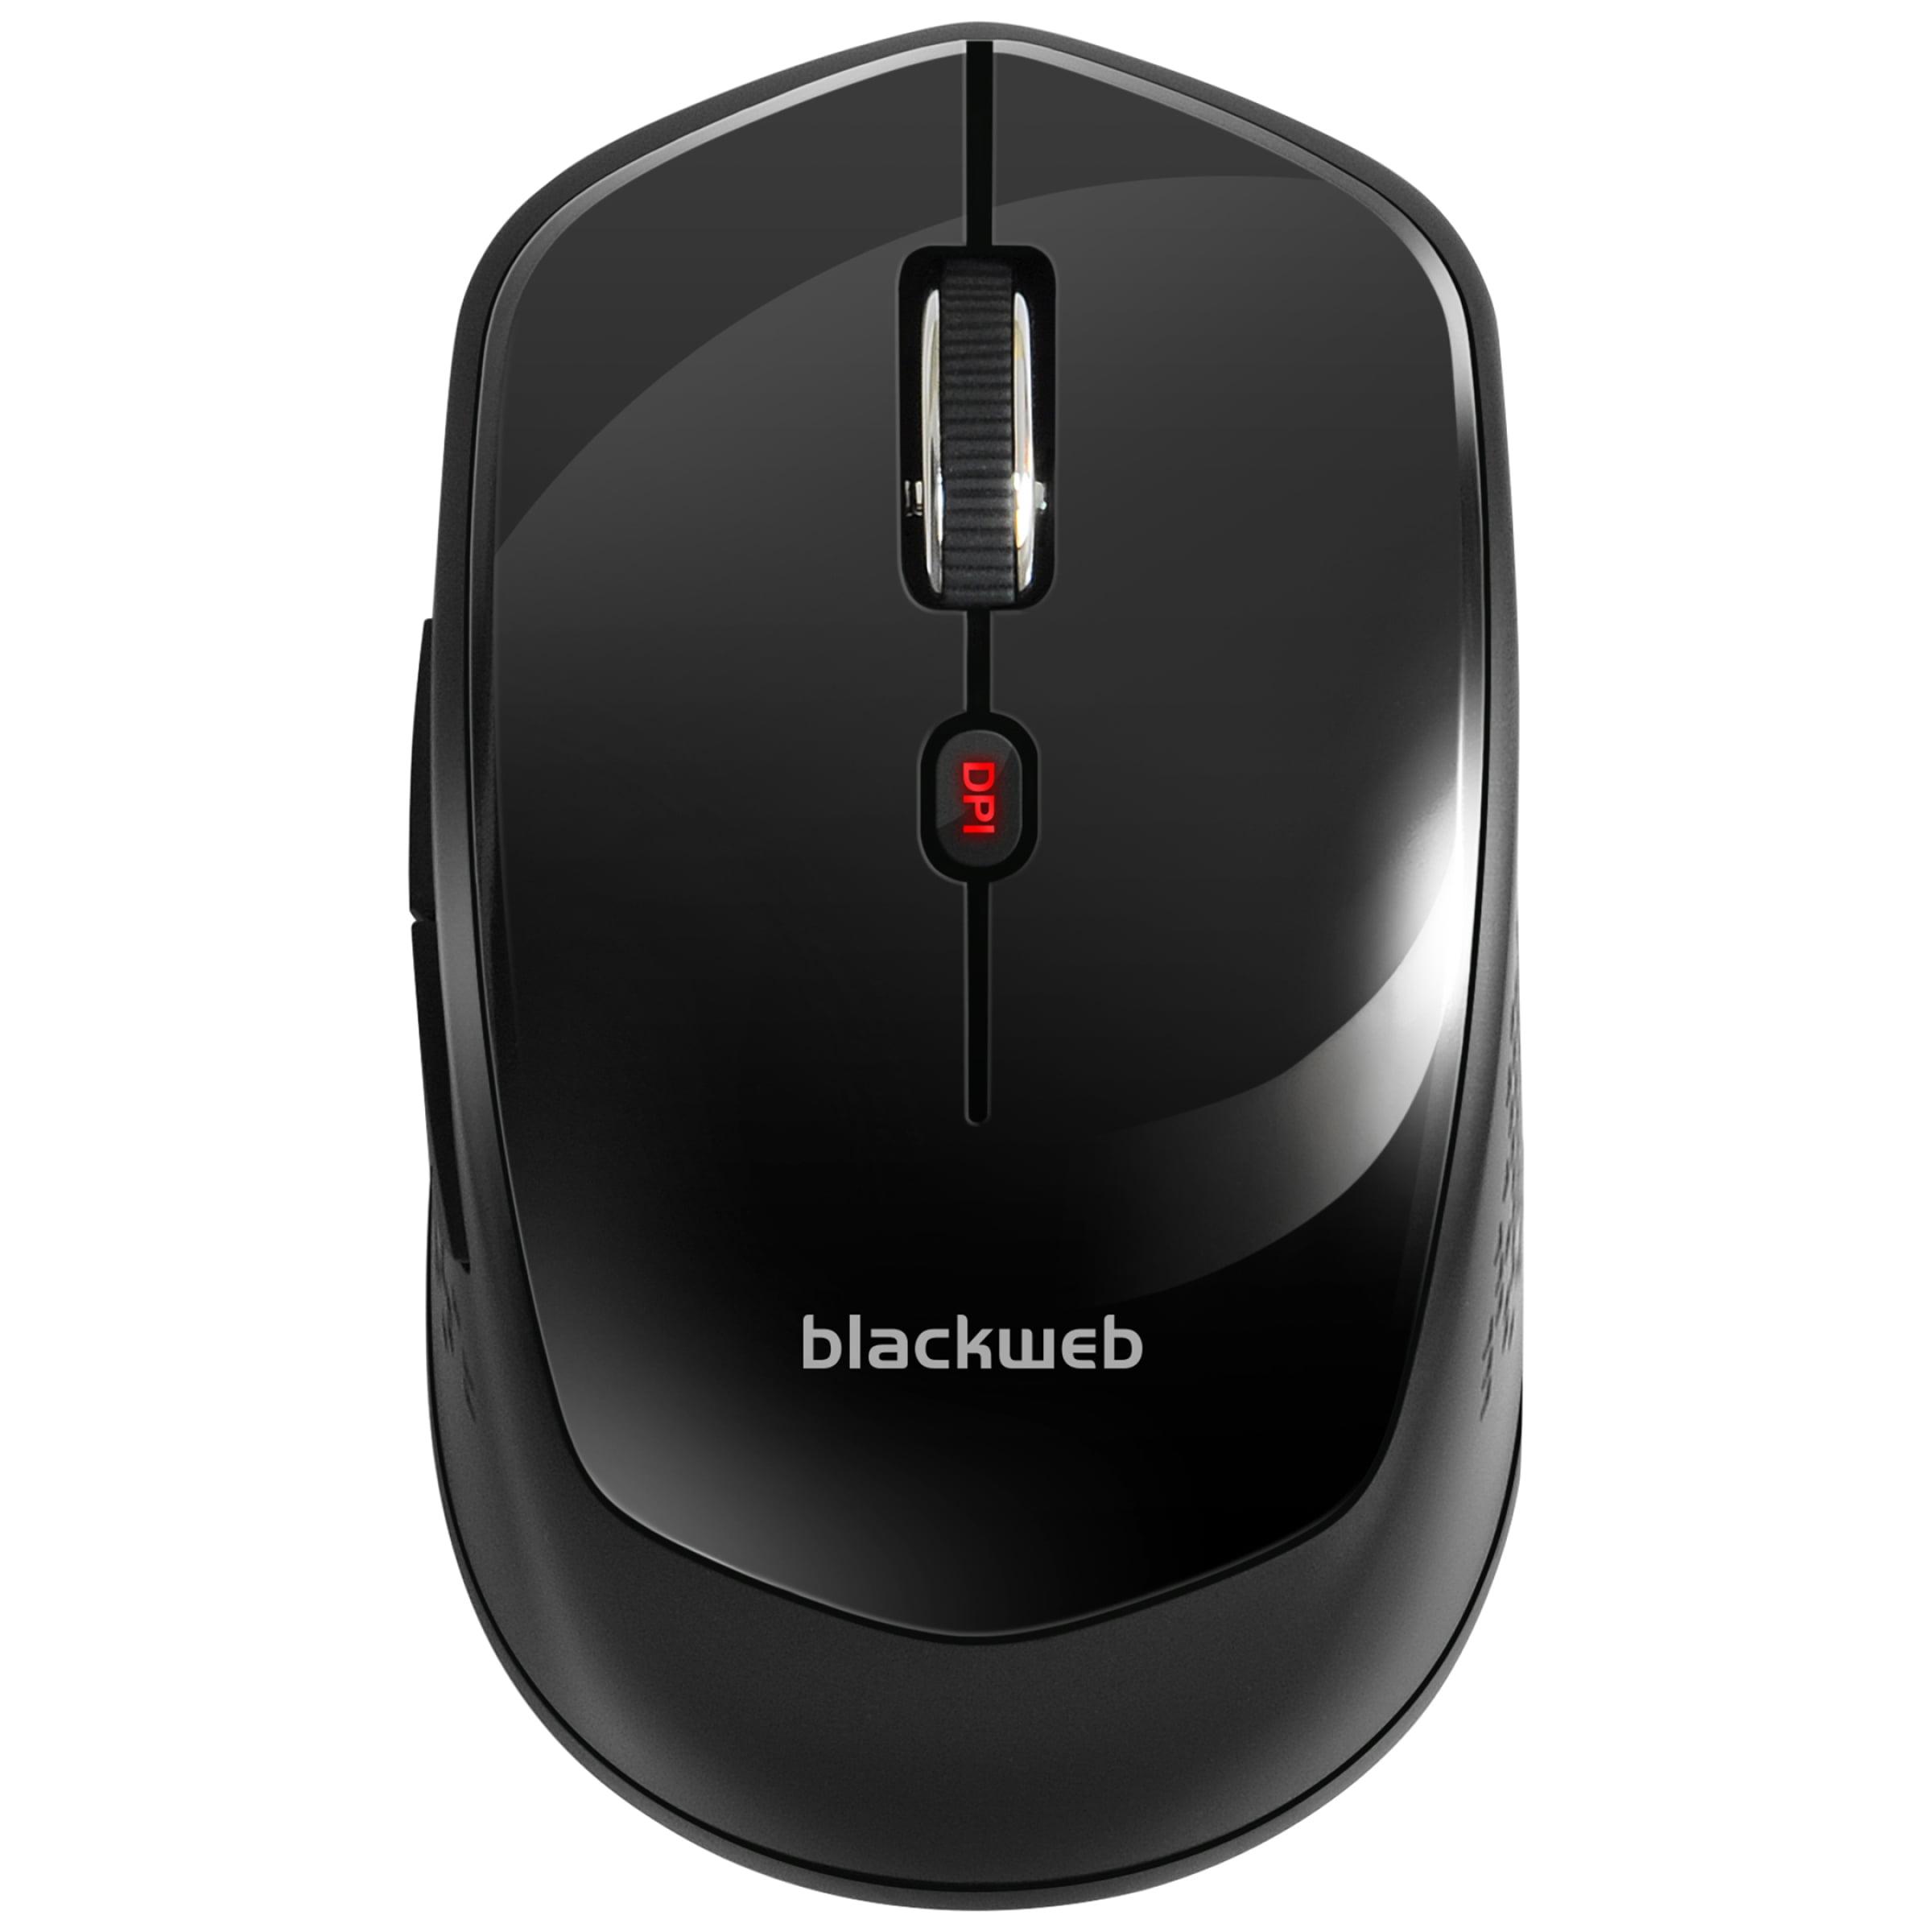 BlackWeb 6-Button Wireless Bluetooth Mouse, Pink by Blackweb